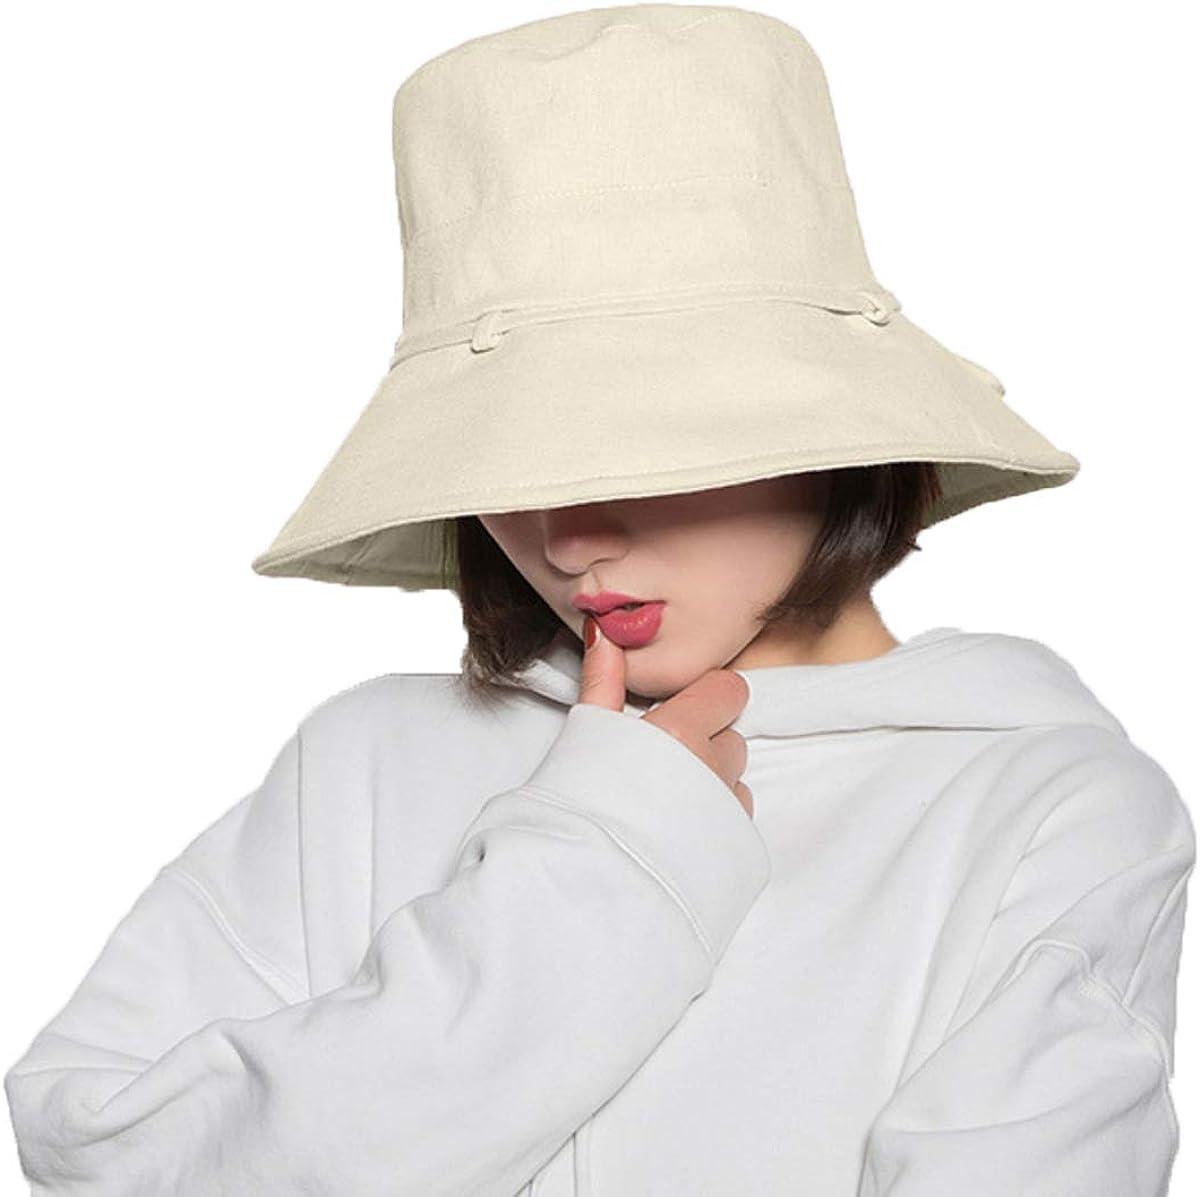 AU/_ Fashion Bucket Hat Fisherman Cap Men/'s Women/'s Summer Outdoor Visor Sun Hat